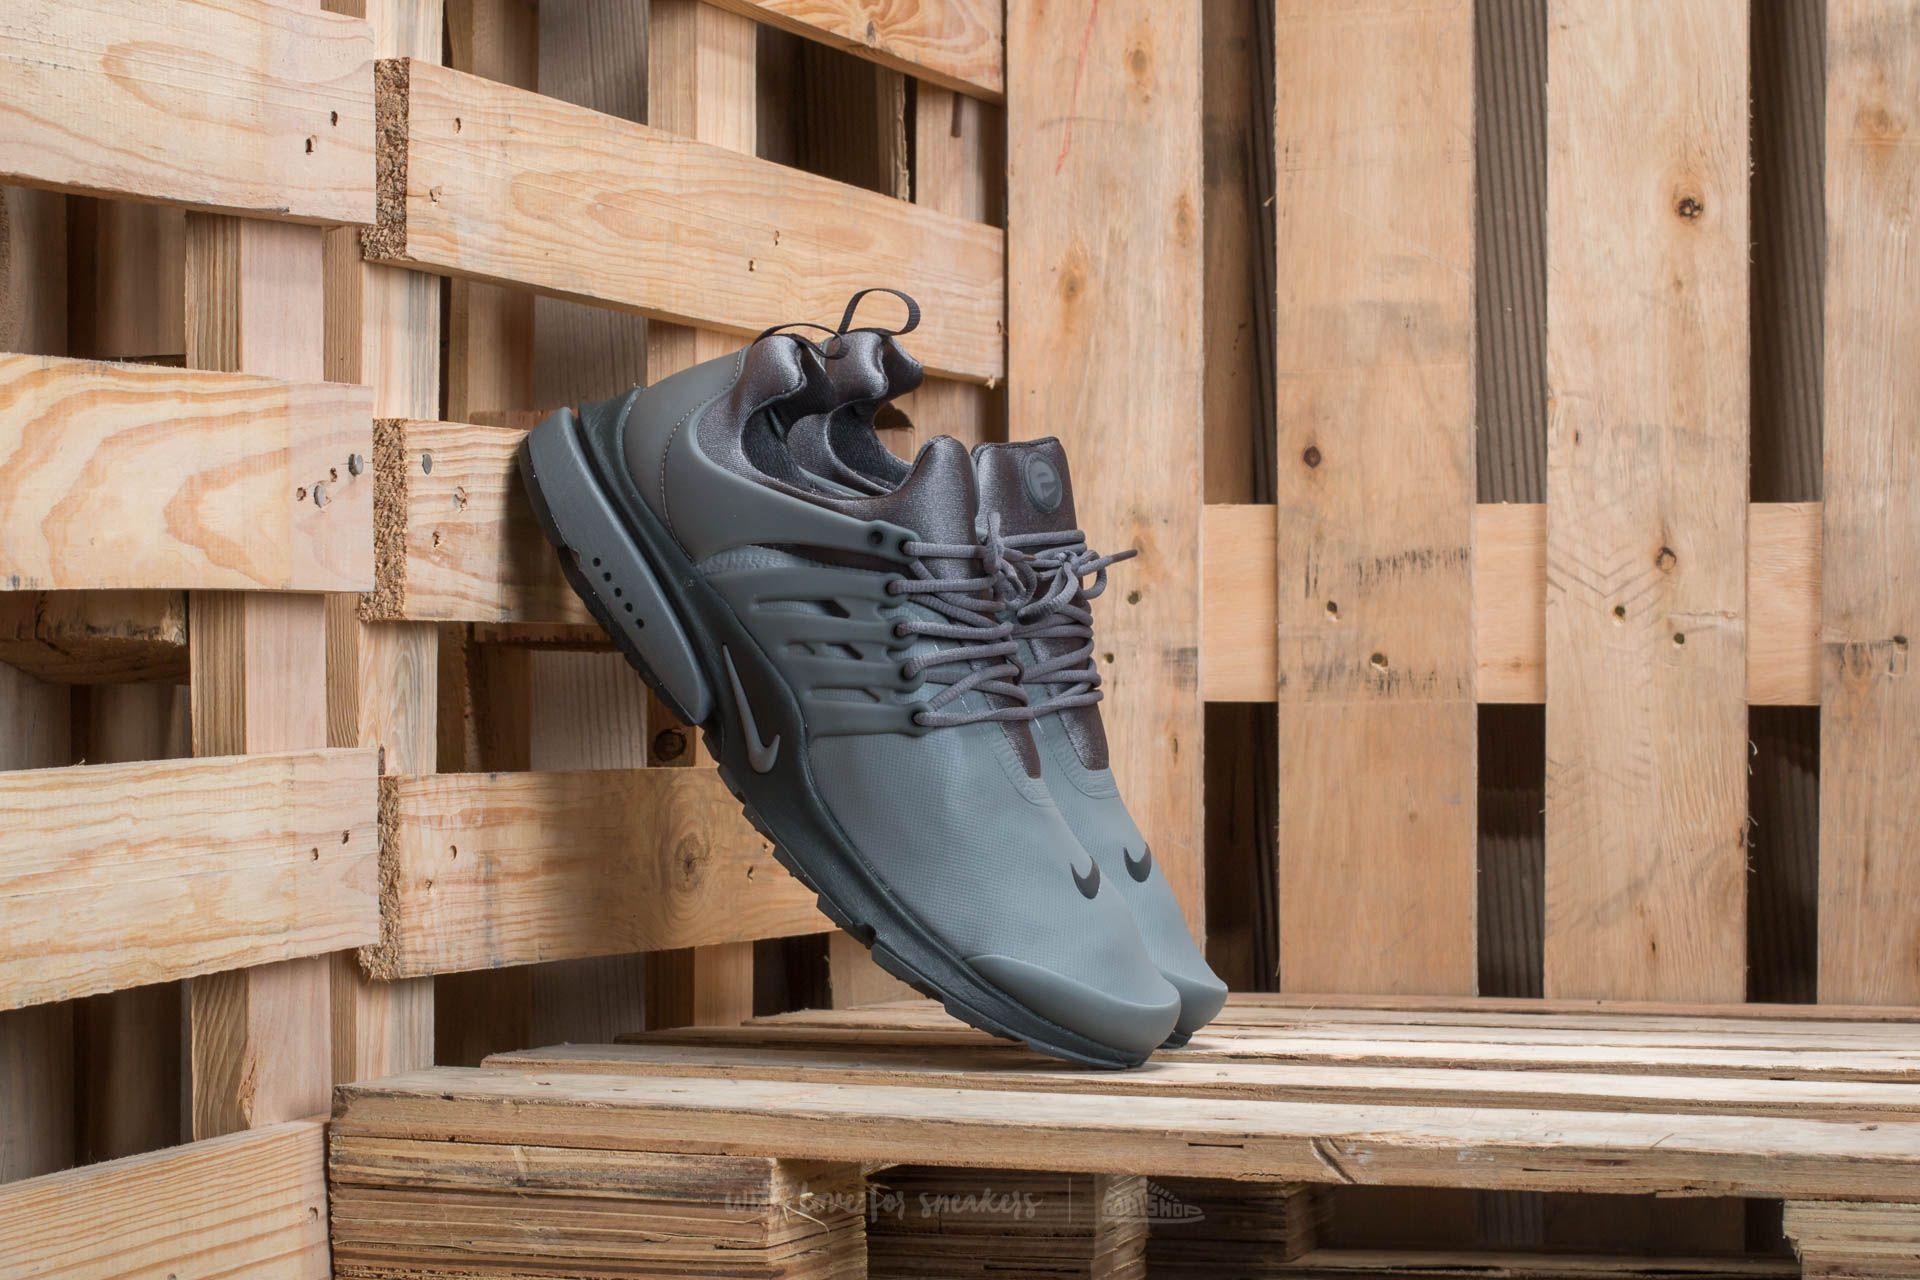 e49228b1a2e2 Nike Air Presto Low Utility Dark Grey  Dark Grey-Anthracite